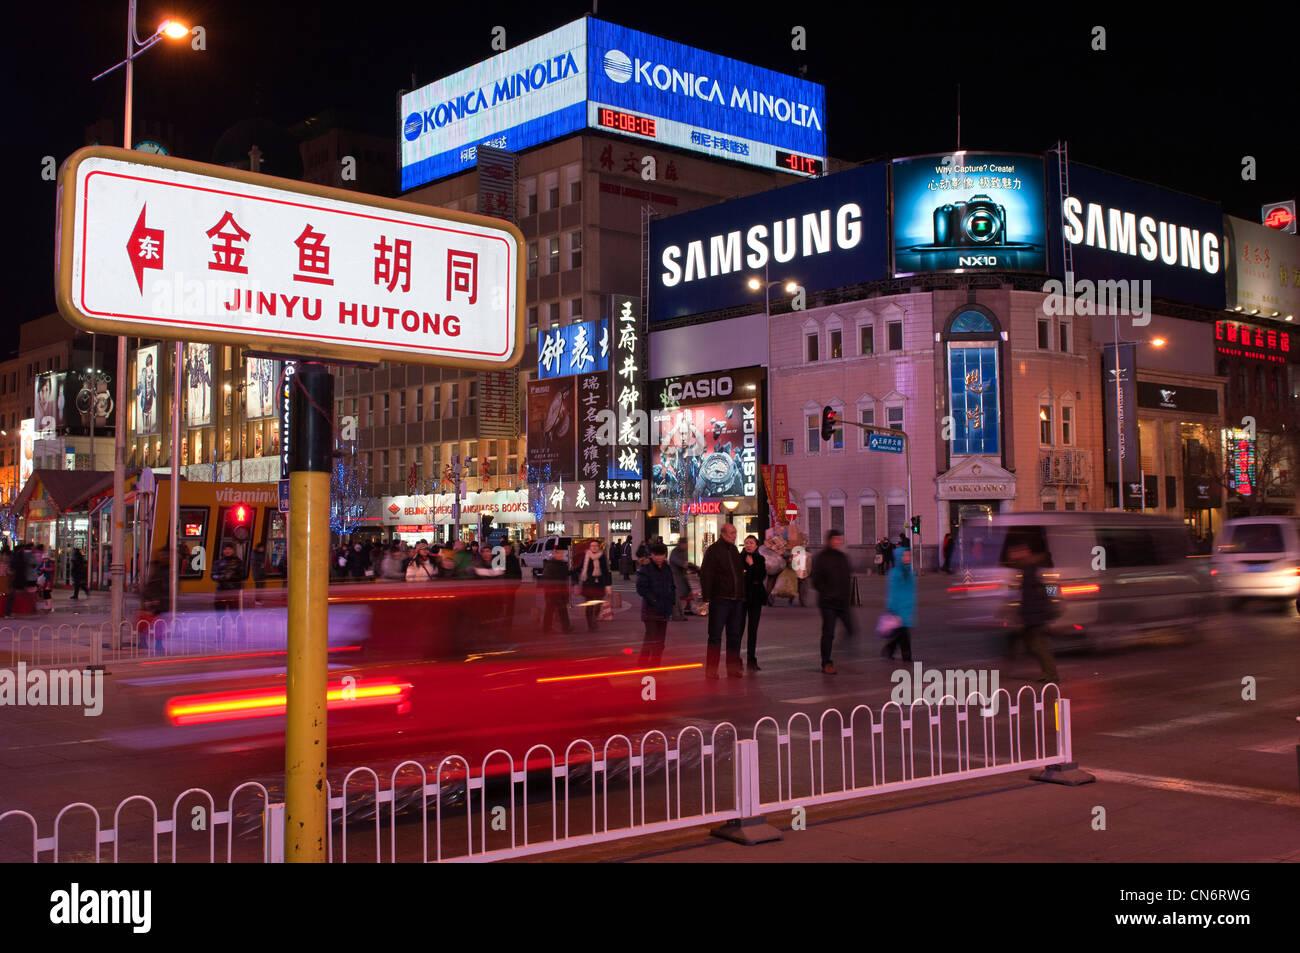 Evening time in the illuminated Wangfujing shopping street, Beijing, China - Stock Image